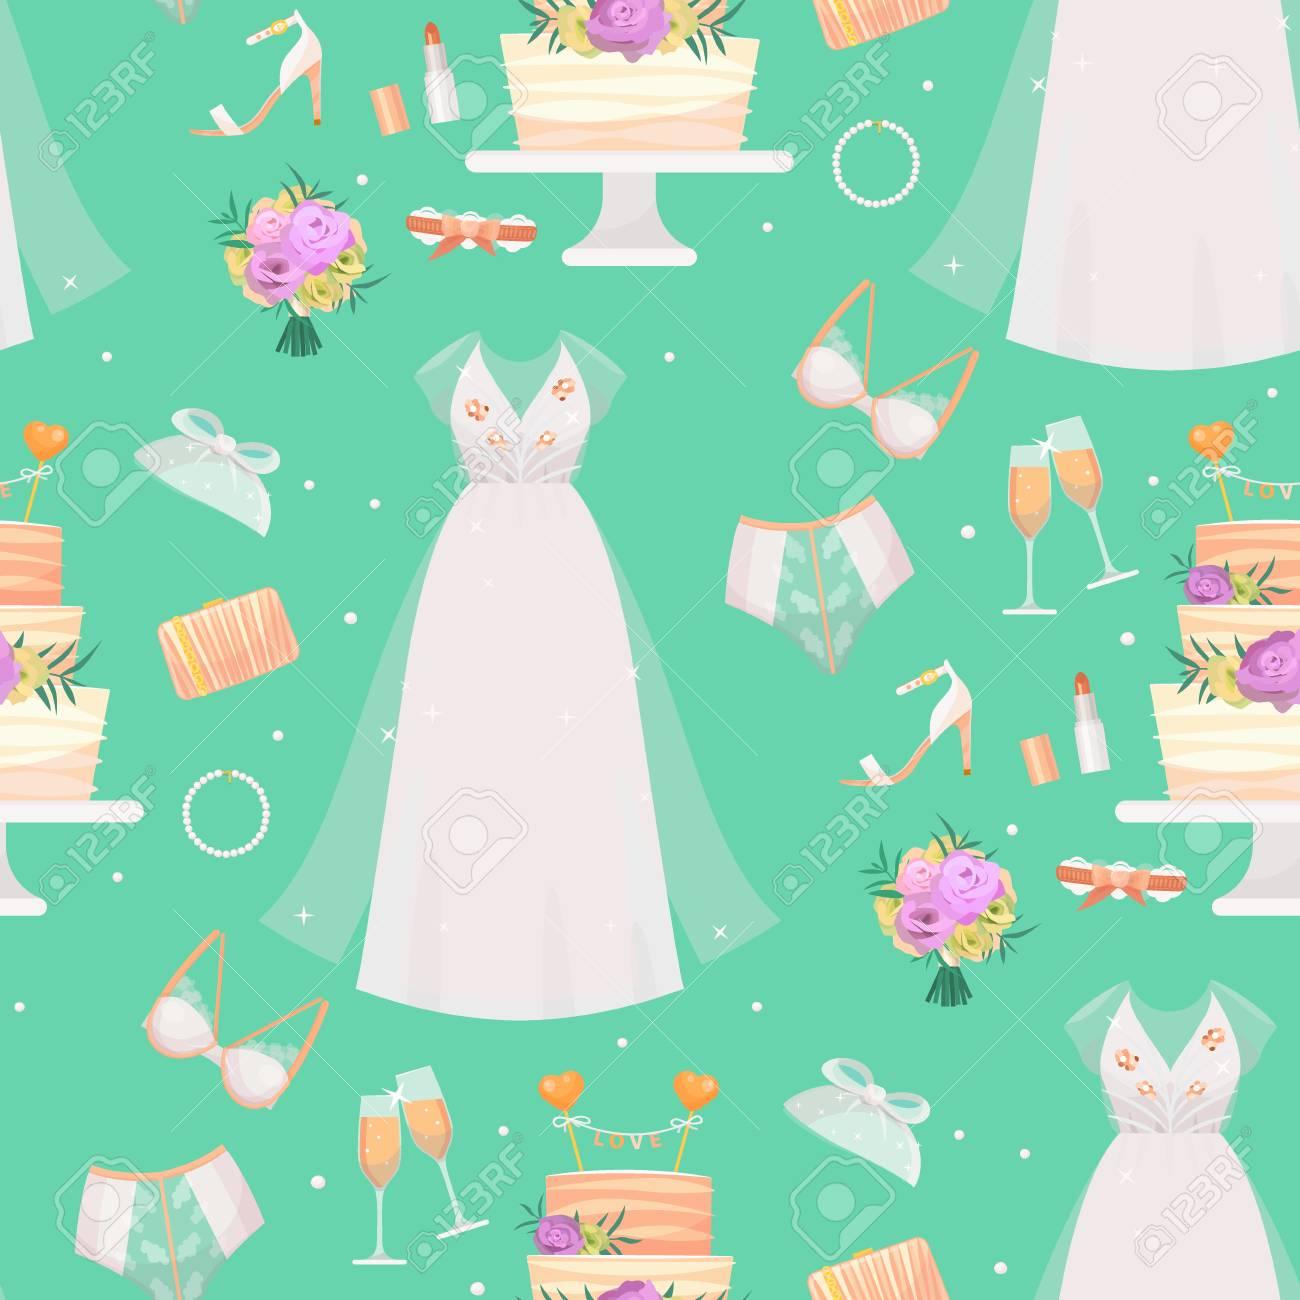 db6fedba508 Vector - Wedding bride dress accessories vector fashion style bridal shower  sketch accessory decor cartoon silhouette portrait illustration